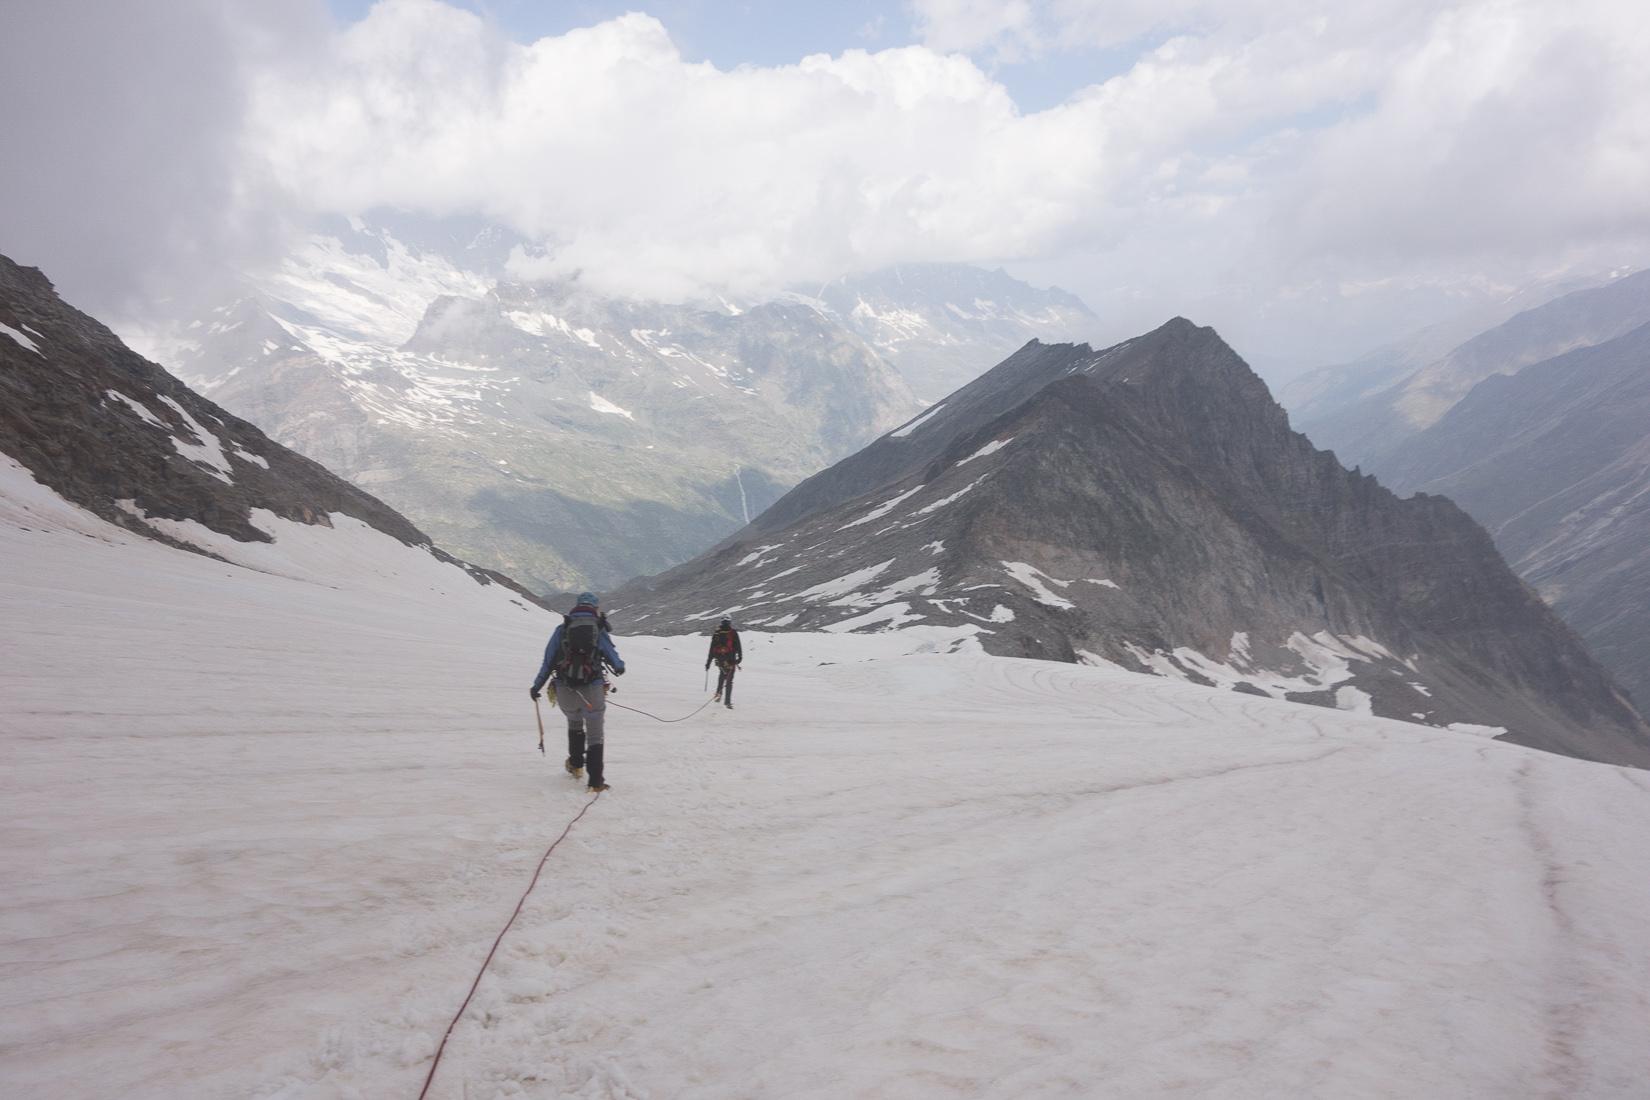 Descending on the Glacier